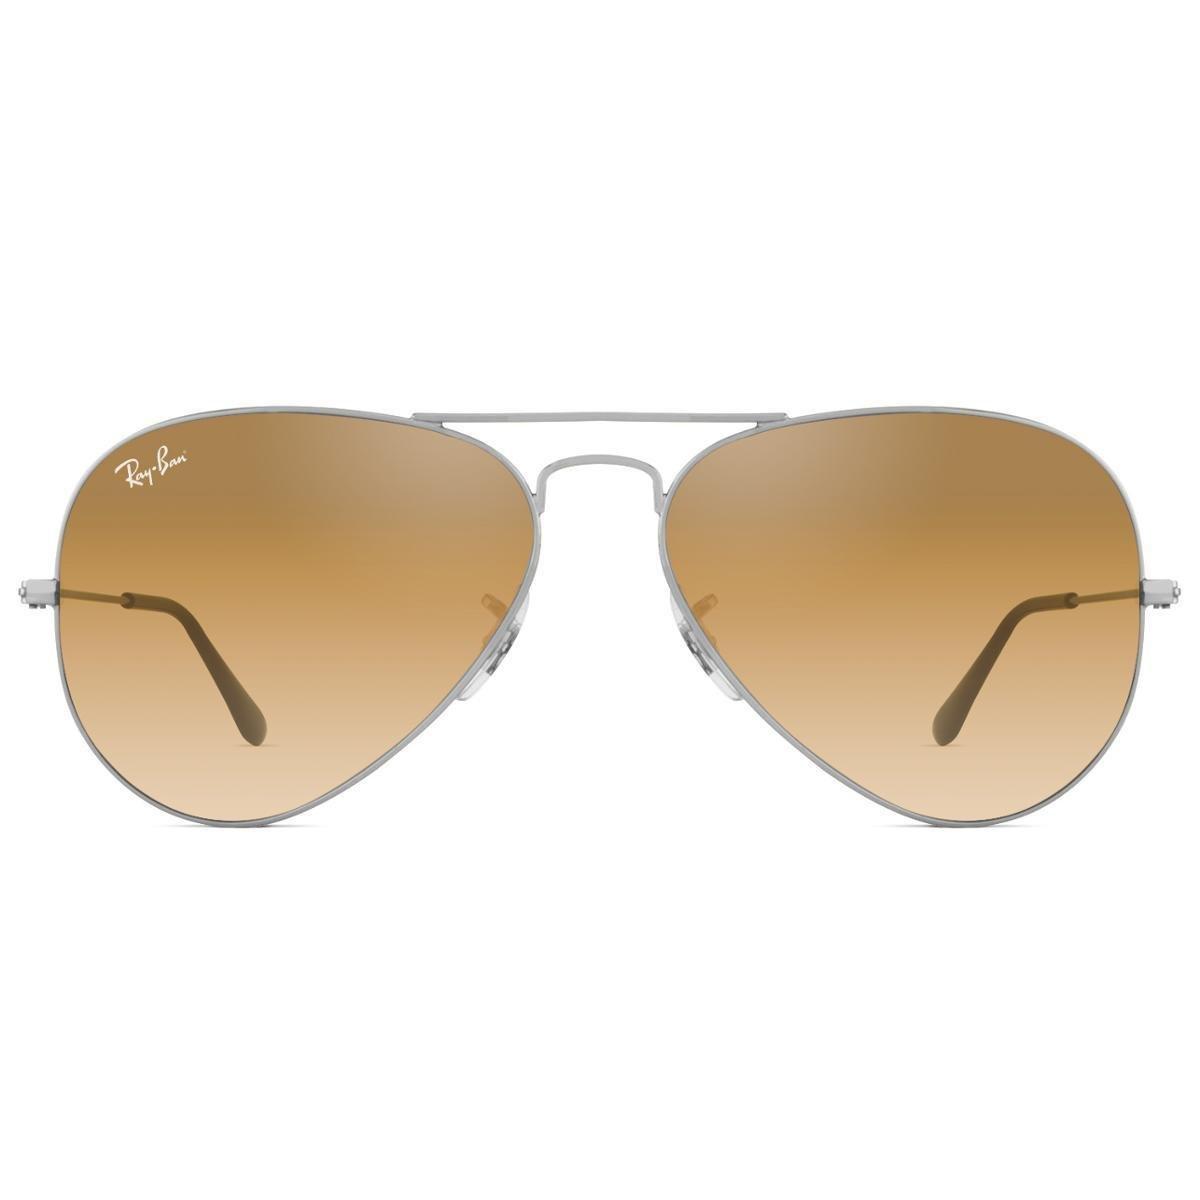 df57b54173784 Óculos de Sol Ray Ban Aviator RB3025L 004 51-58 Feminino - Compre Agora    Netshoes